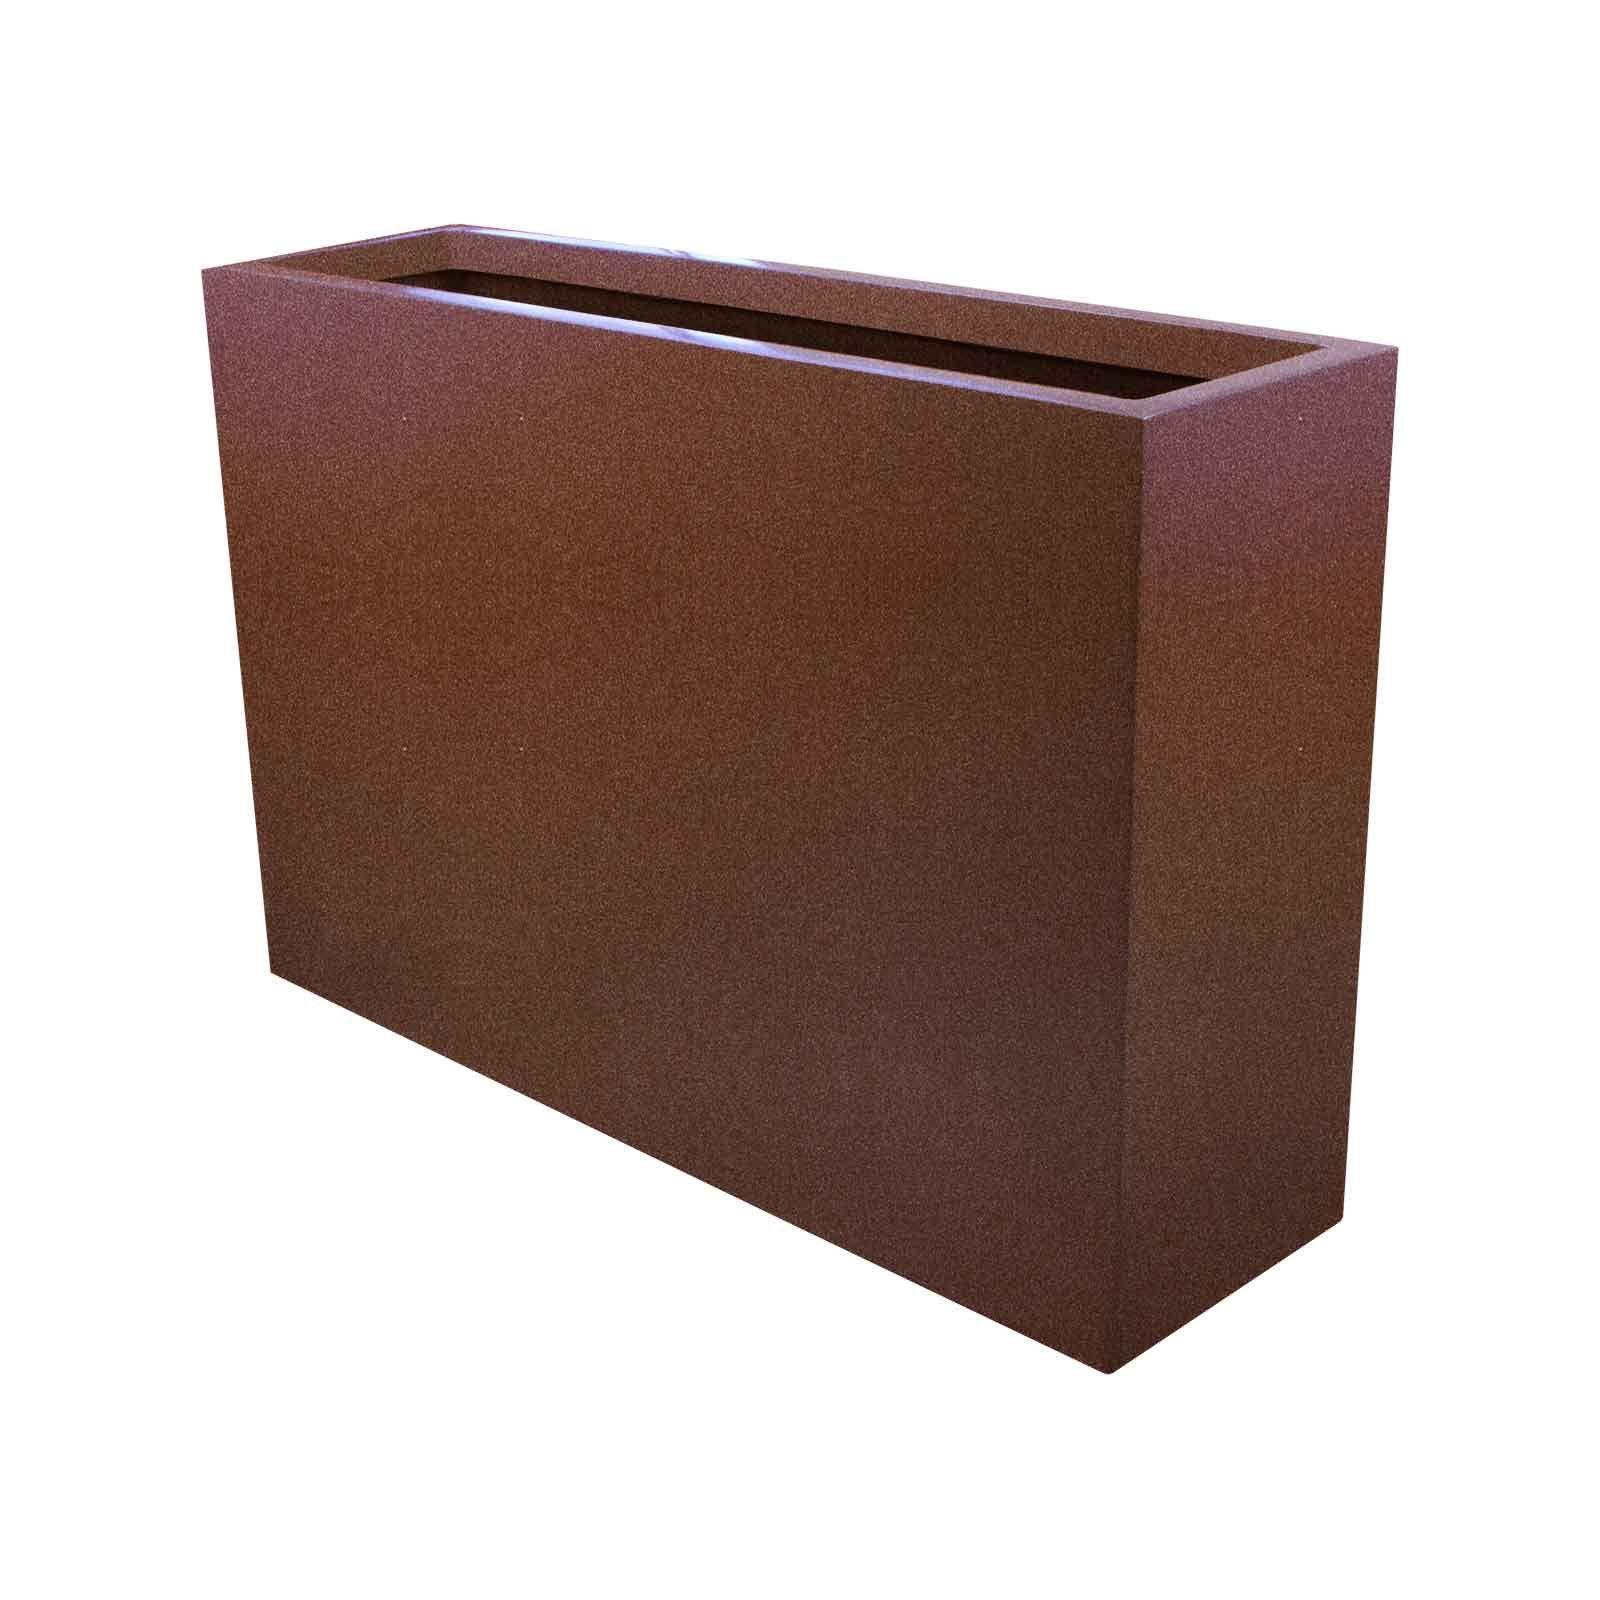 "Narrow Planter Boxes Fiberglass 24"" Tall 24"" 36"" Length 10"